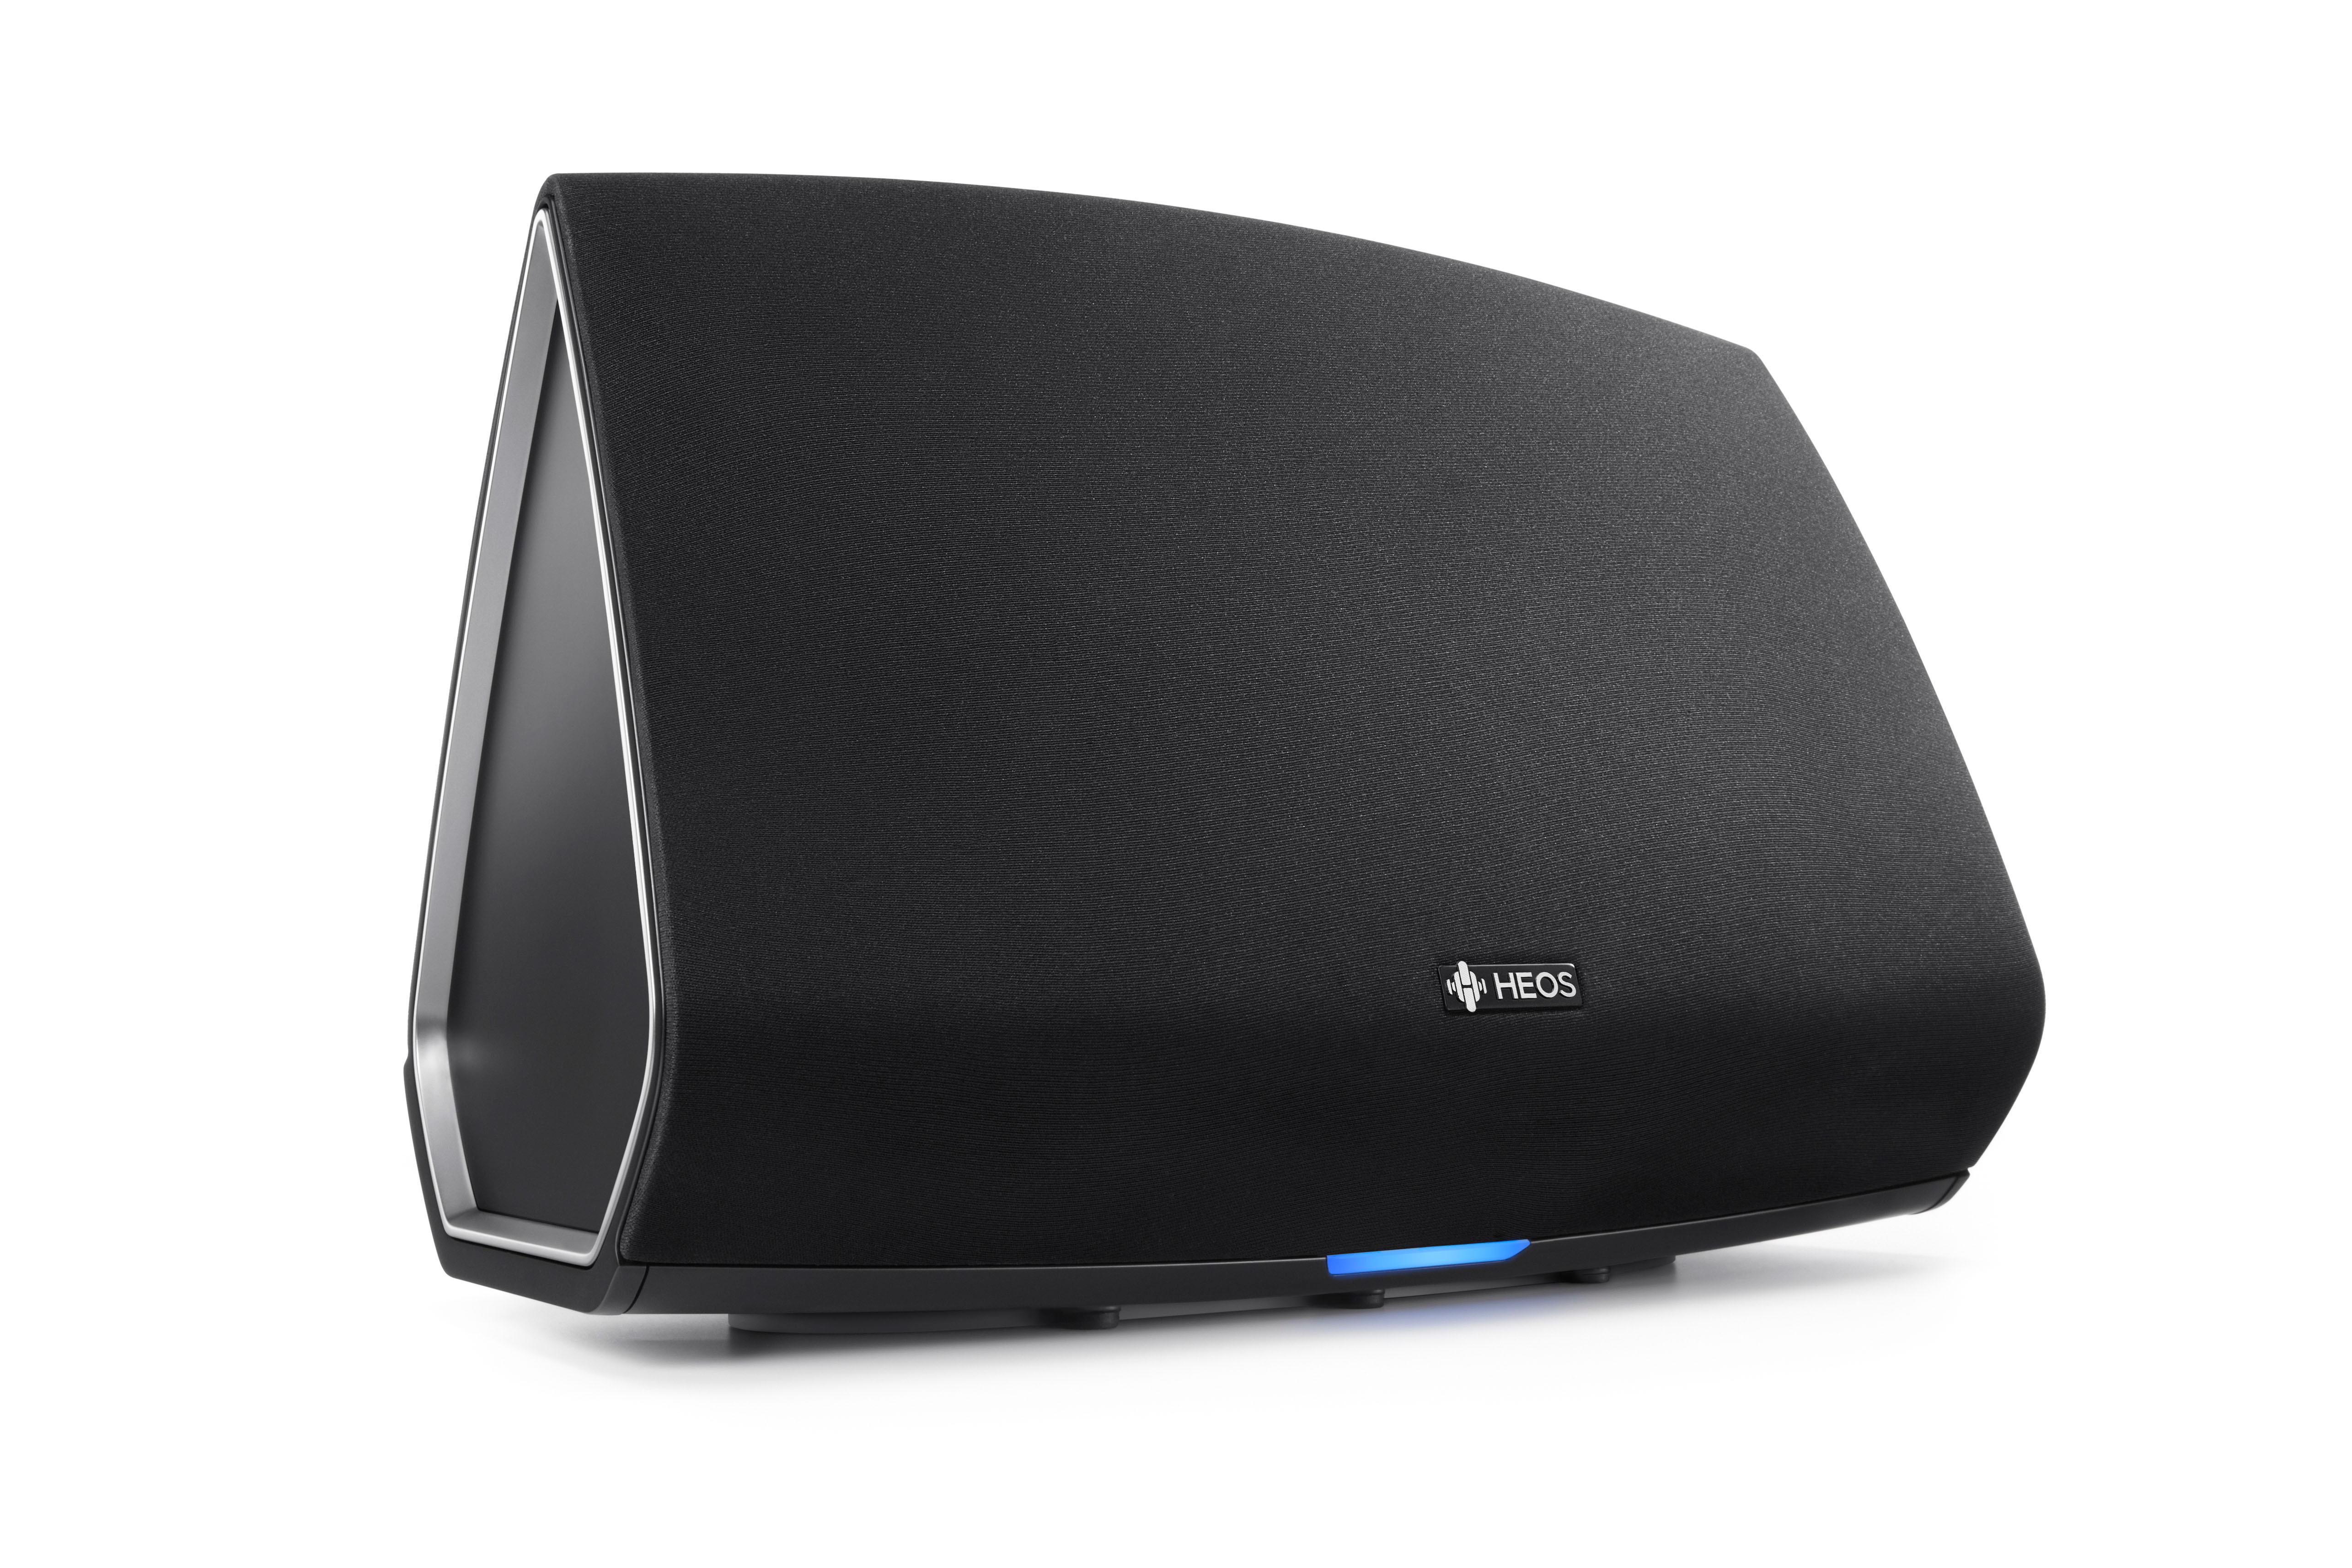 Denon Heos 5 HS2 Multiroom Bluetooth speaker review | TechRadar